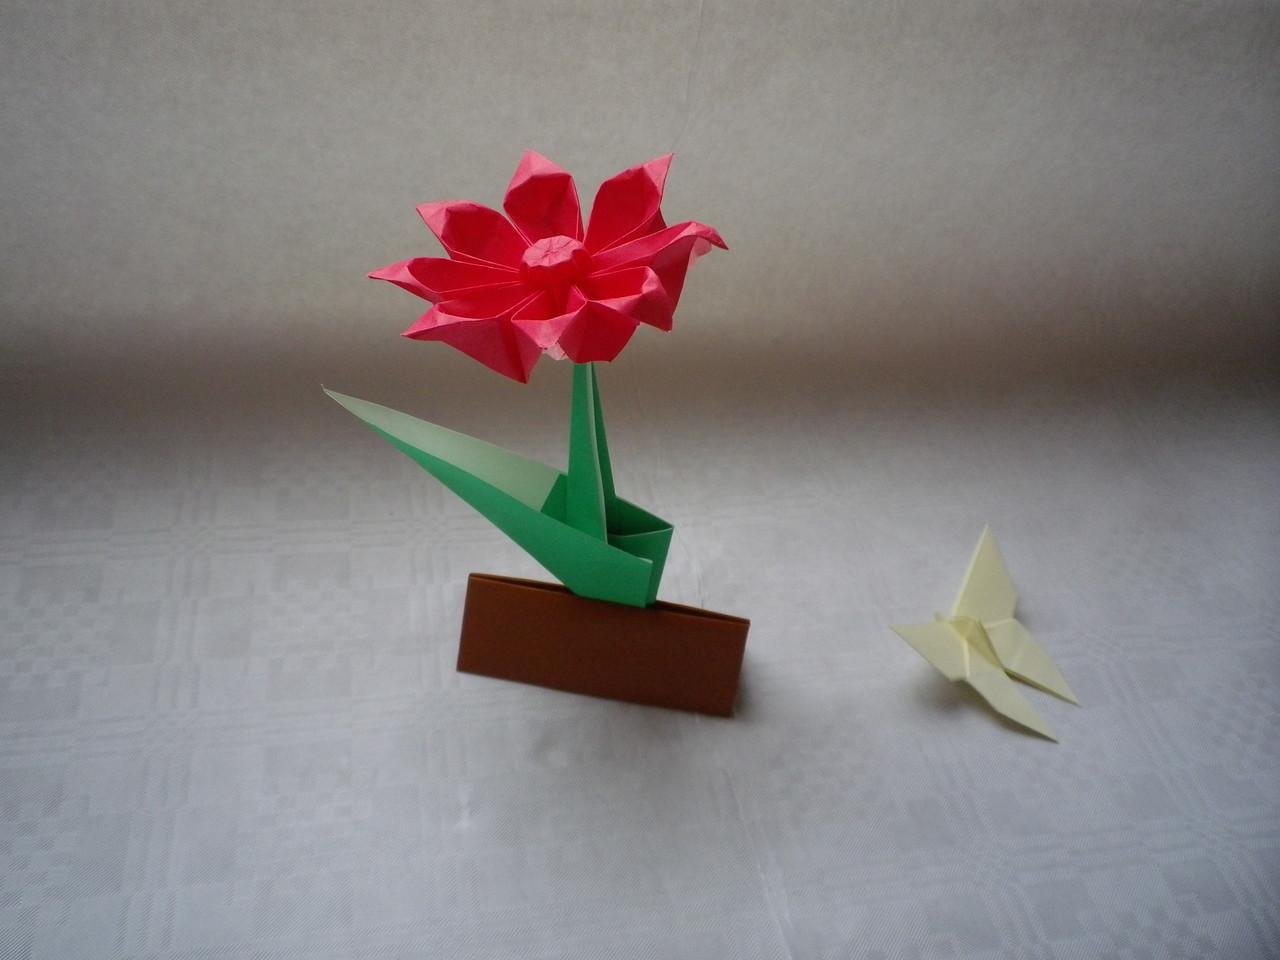 Blume von Makoto Yamaguchi, Schmetterling von Akira Yoshizawa